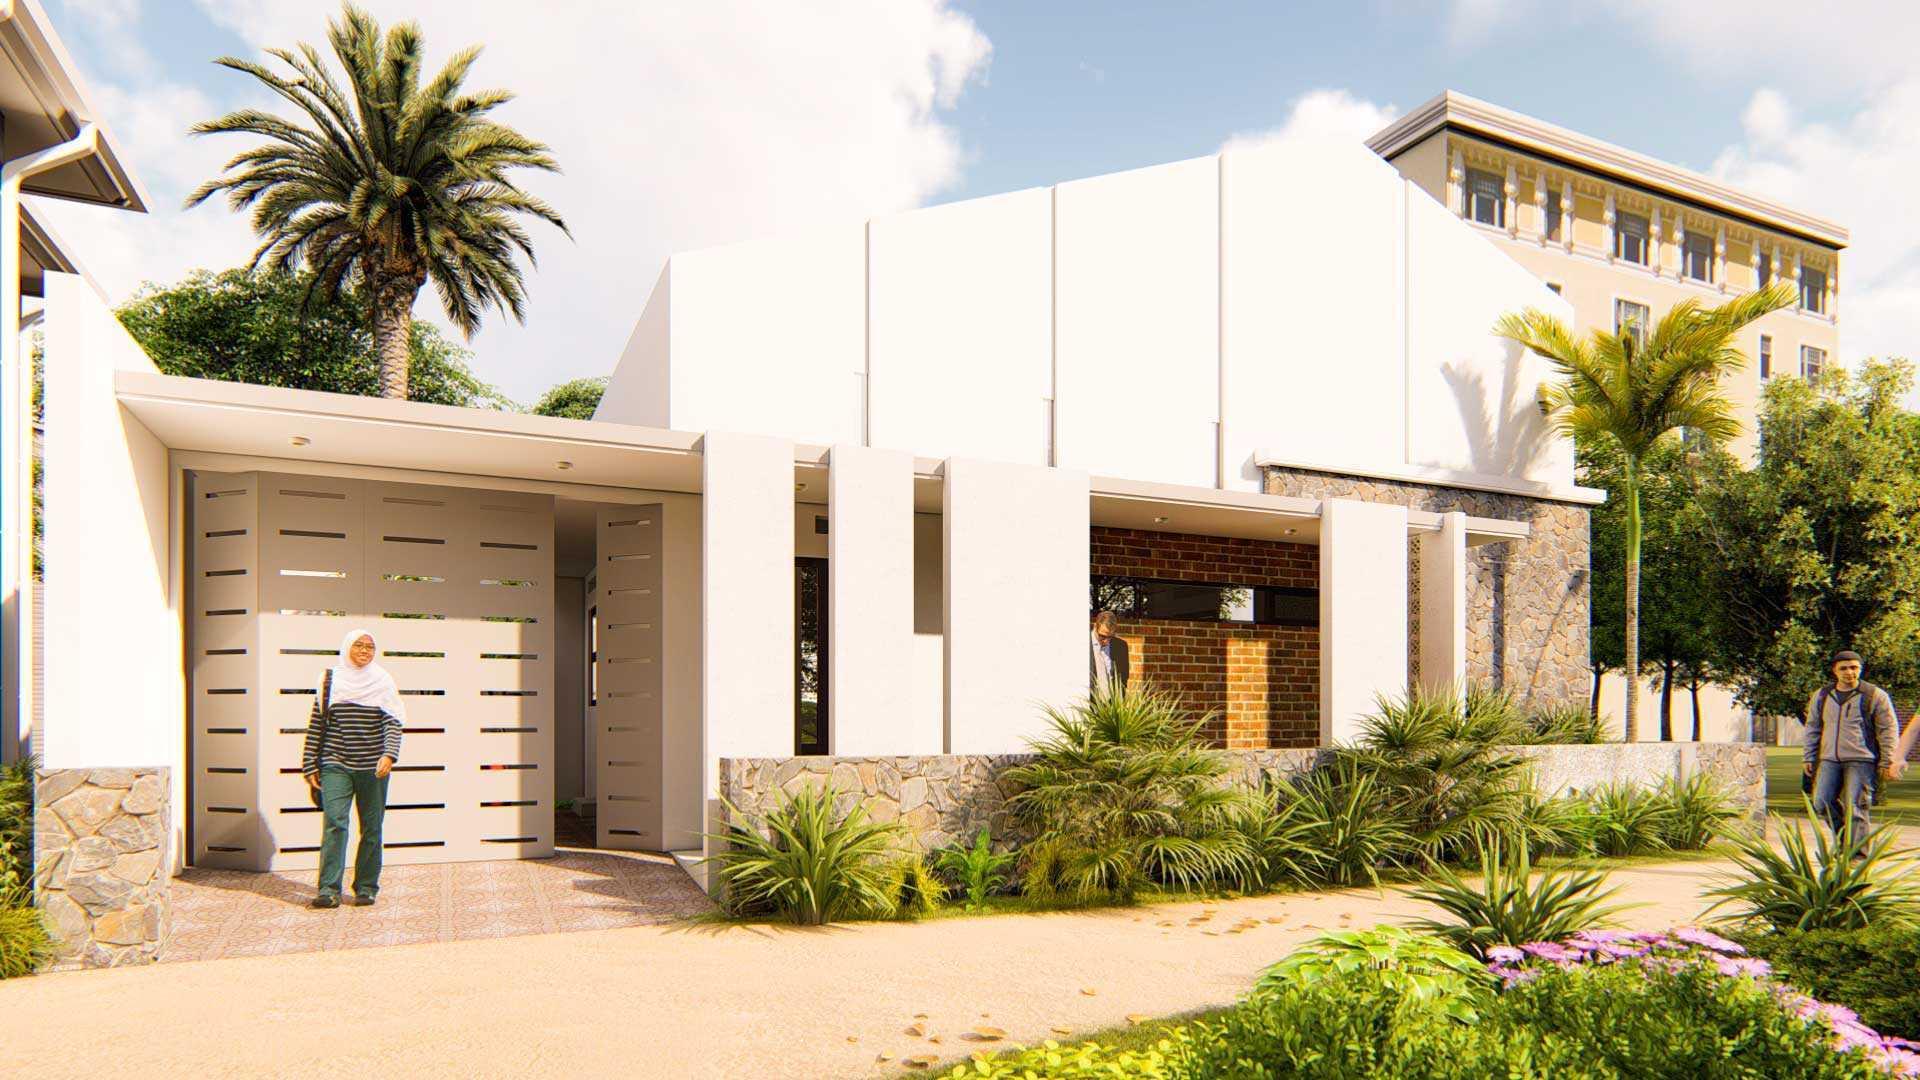 Nggambar Omah | Design And Build The Natunacorner Whitehouse Blitar, Kota Blitar, Jawa Timur, Indonesia Blitar, Kota Blitar, Jawa Timur, Indonesia Vizual Siang Hari Contemporary 55702